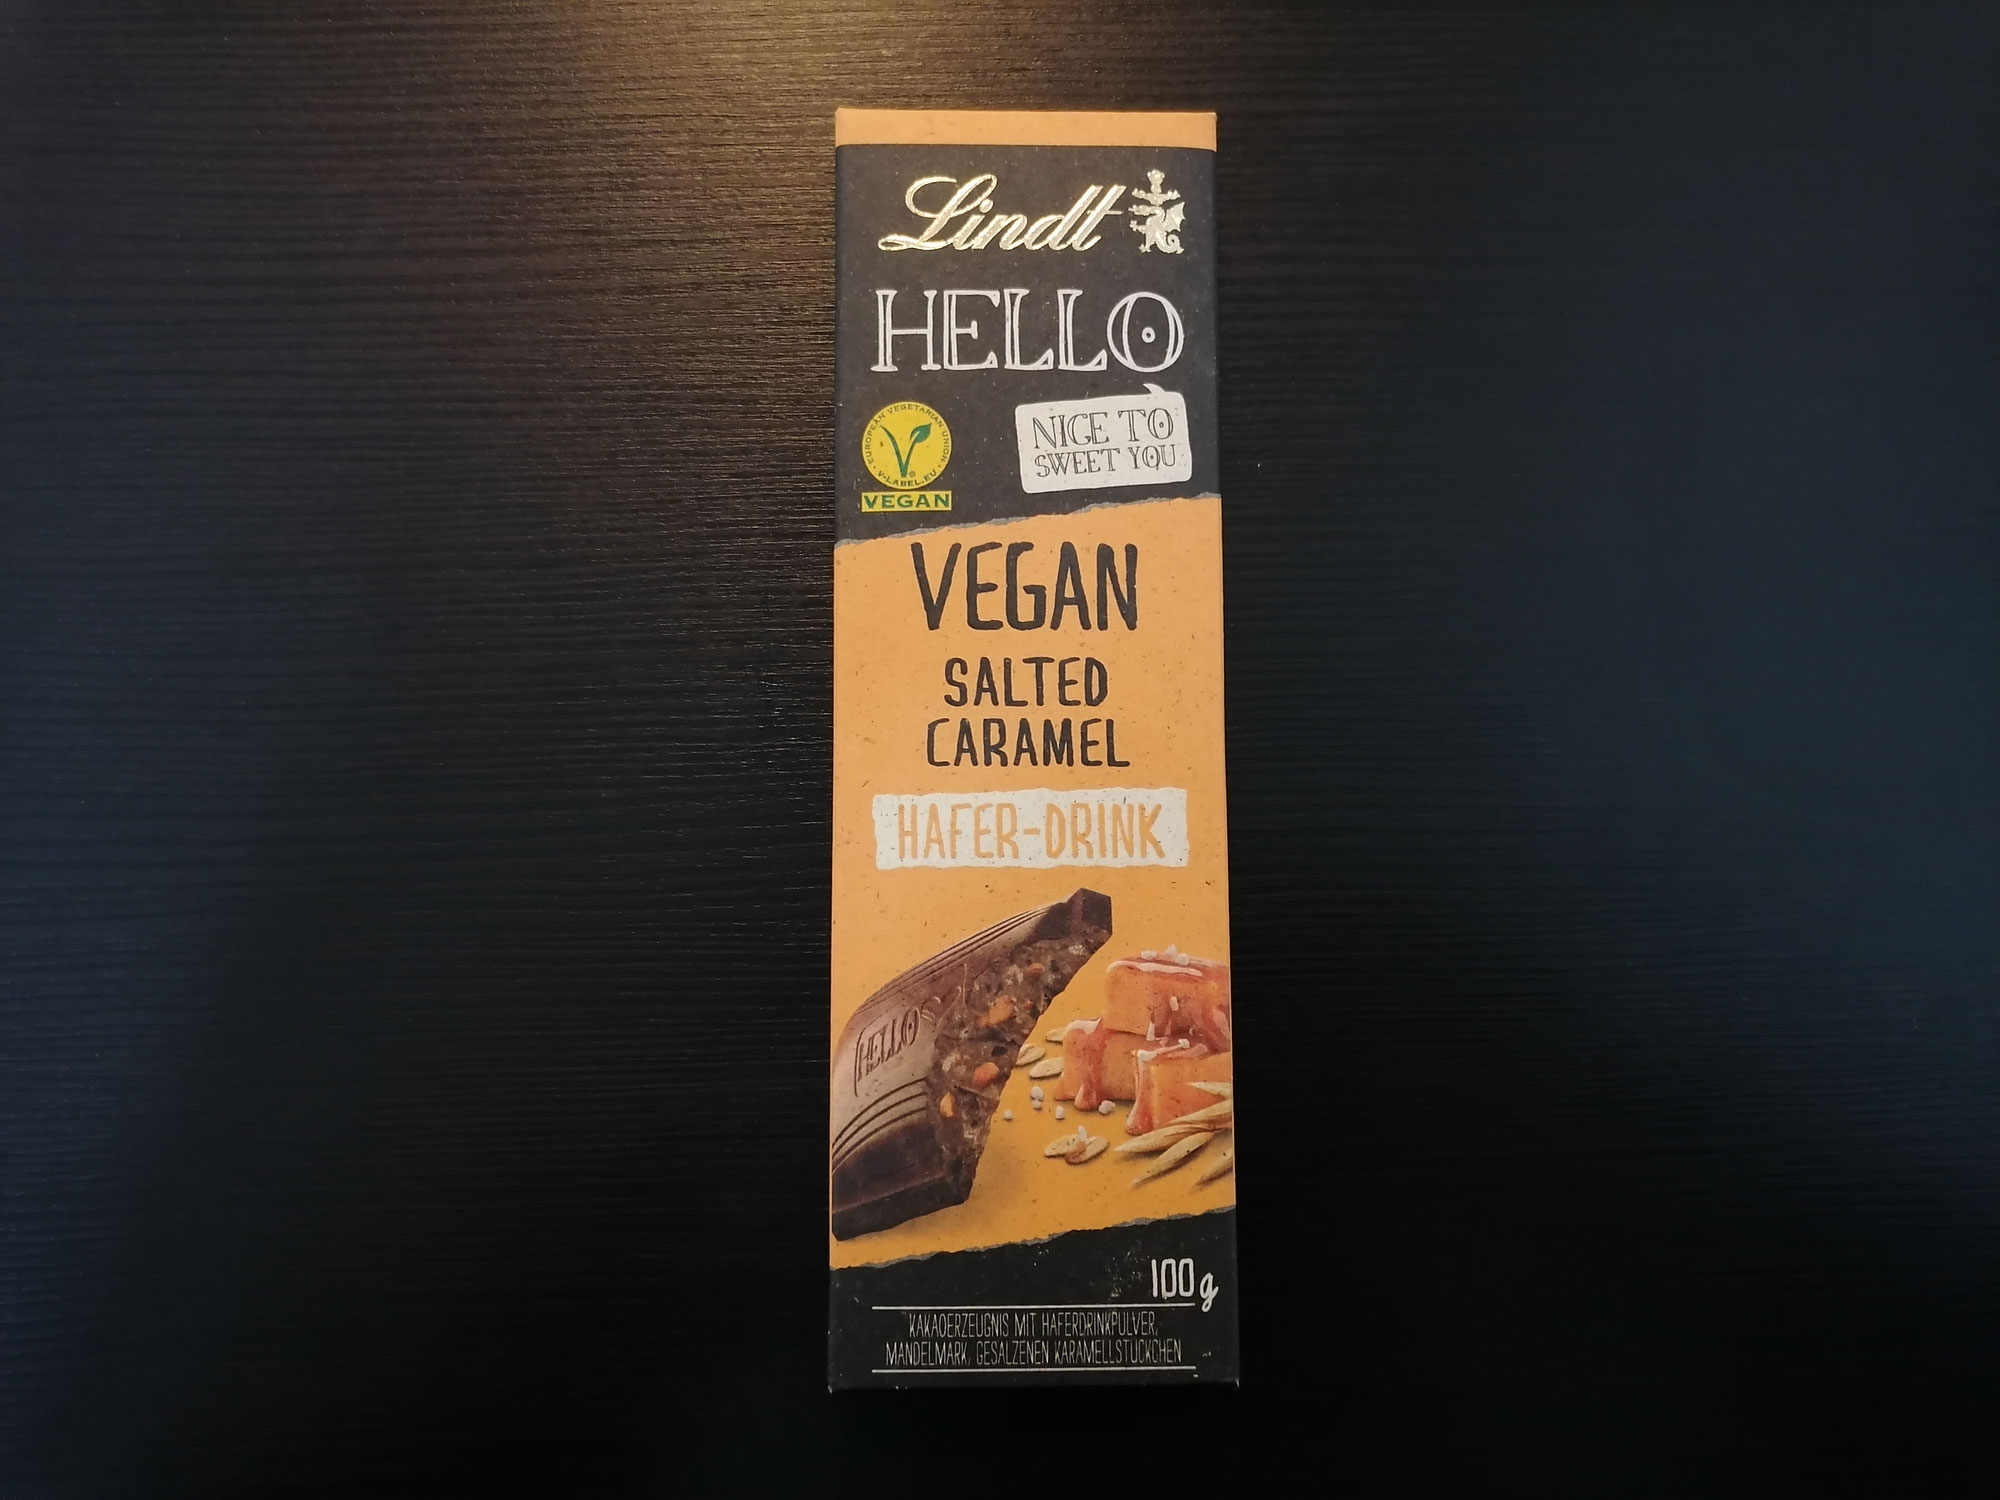 Lindt Hello vegan Salted Caramel